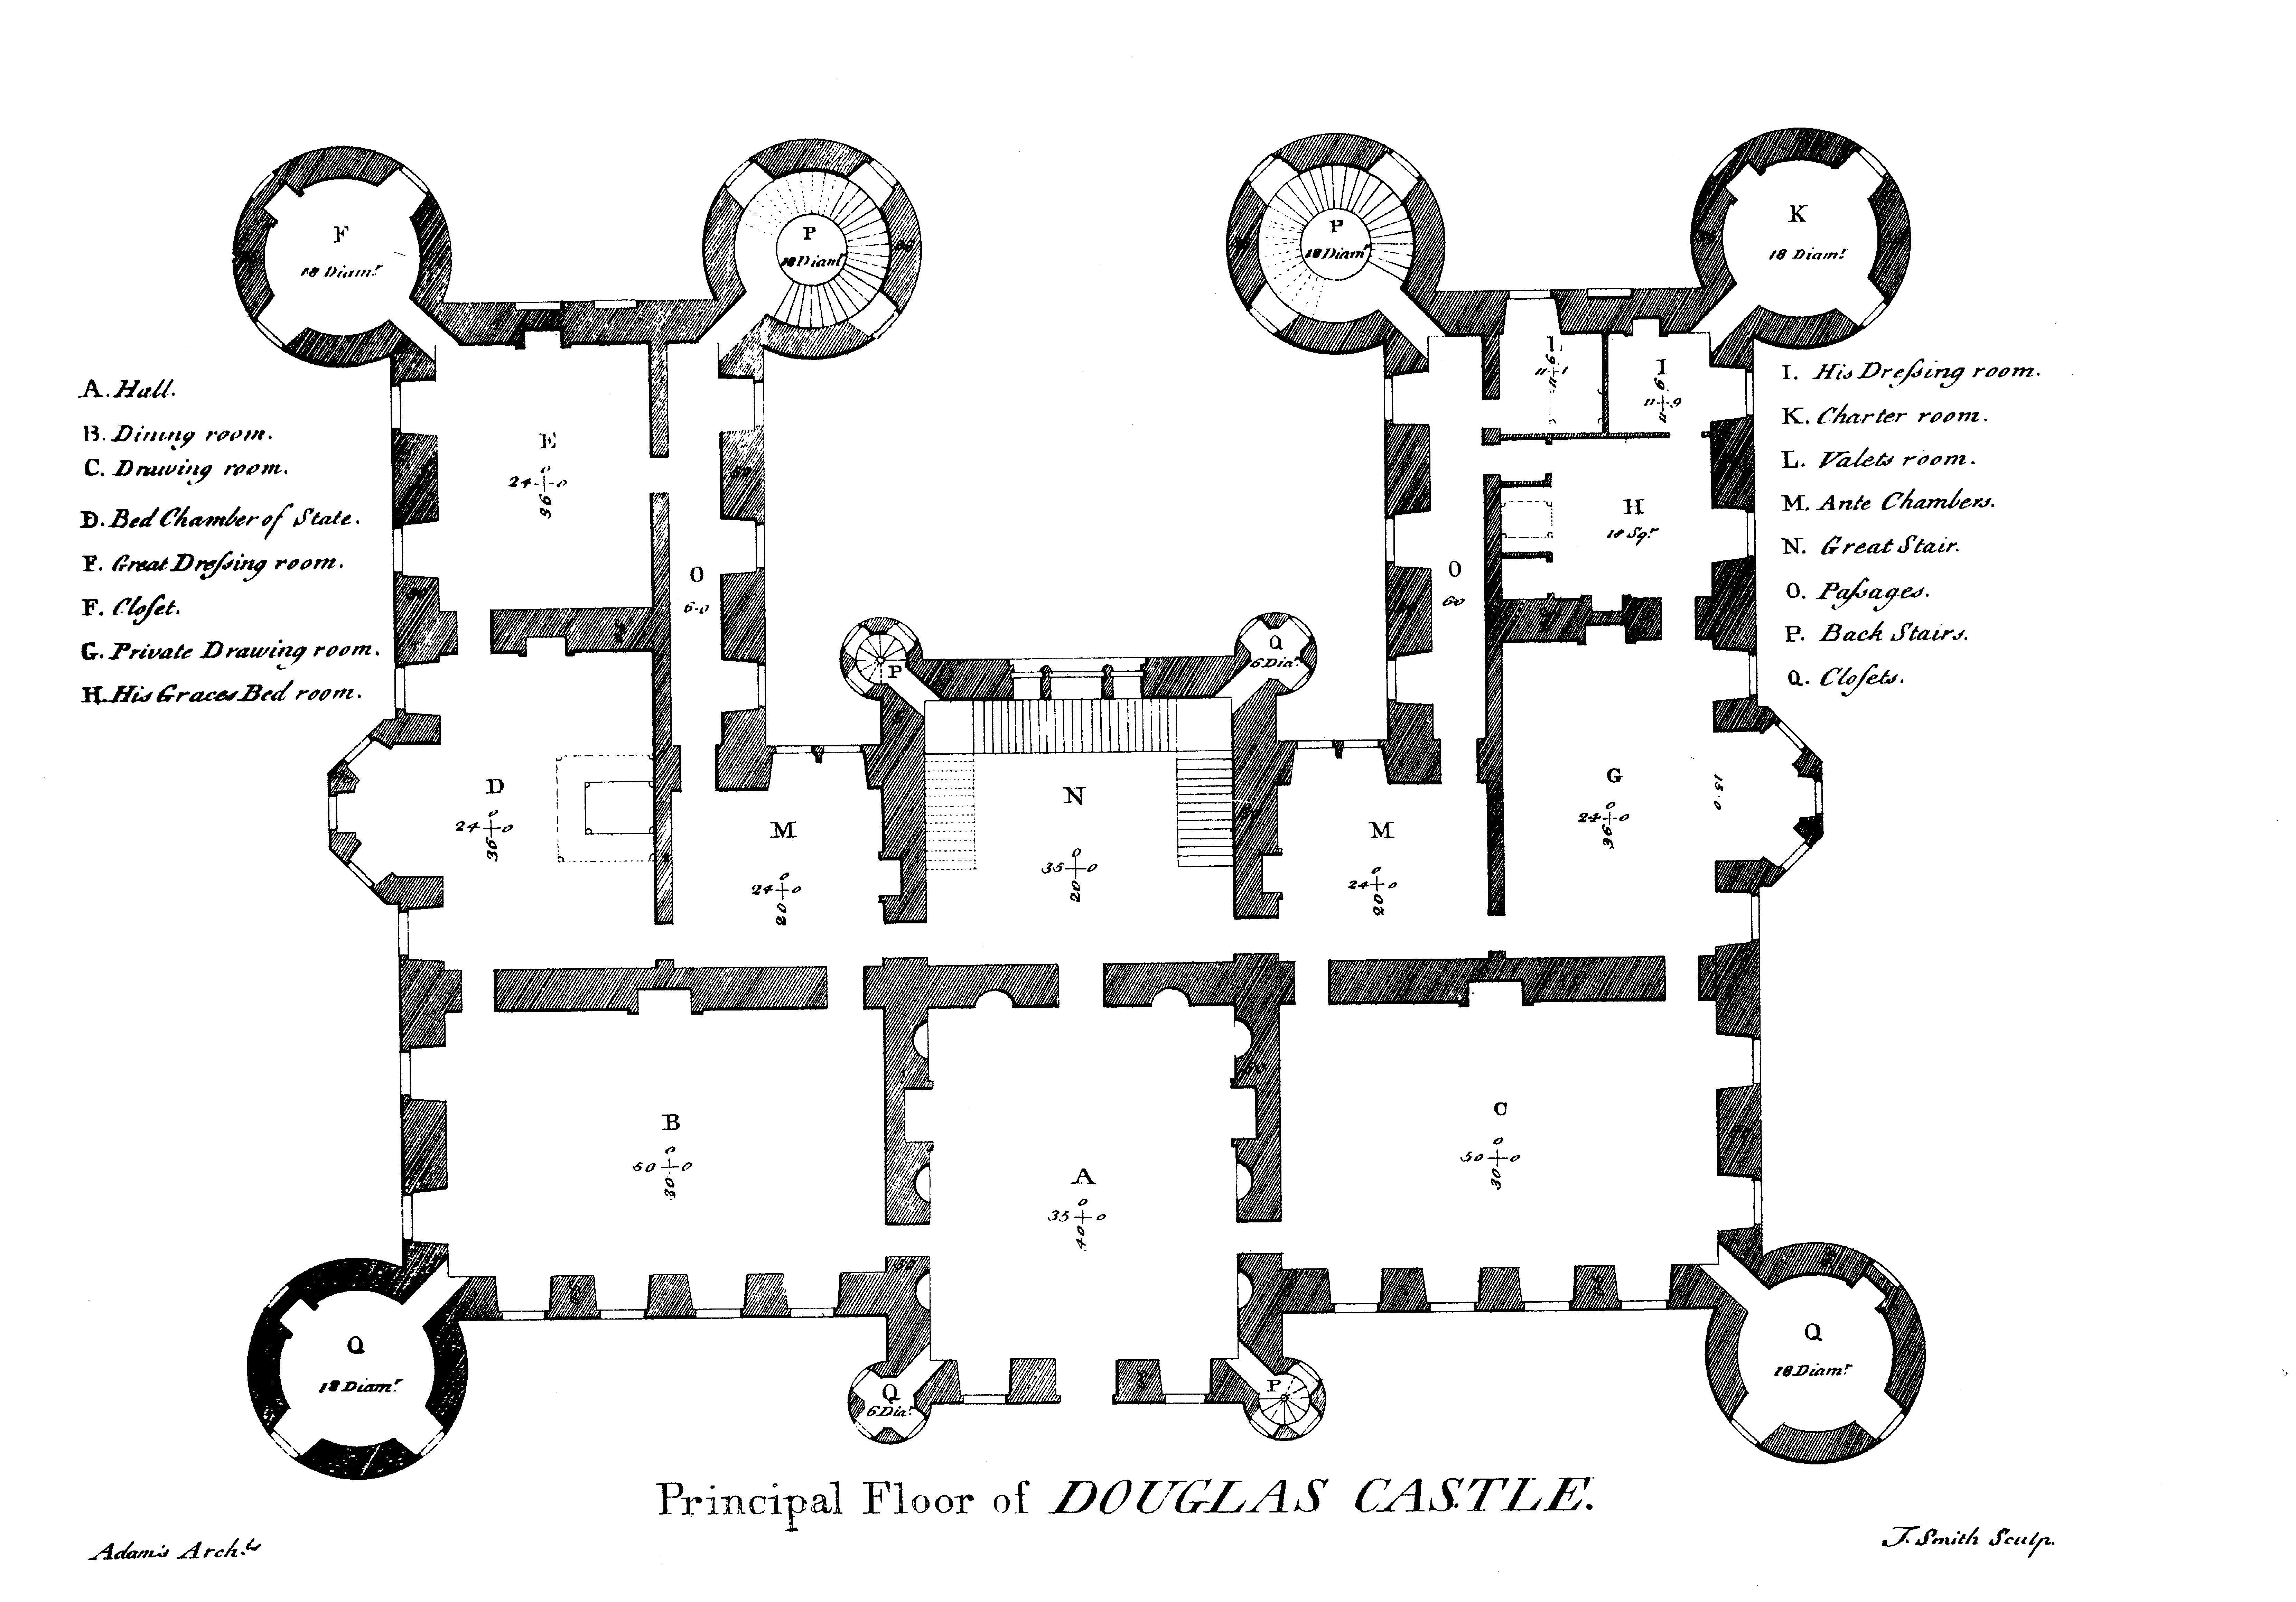 Douglas castle FloorPlan Pinterest Floor plans Floors and